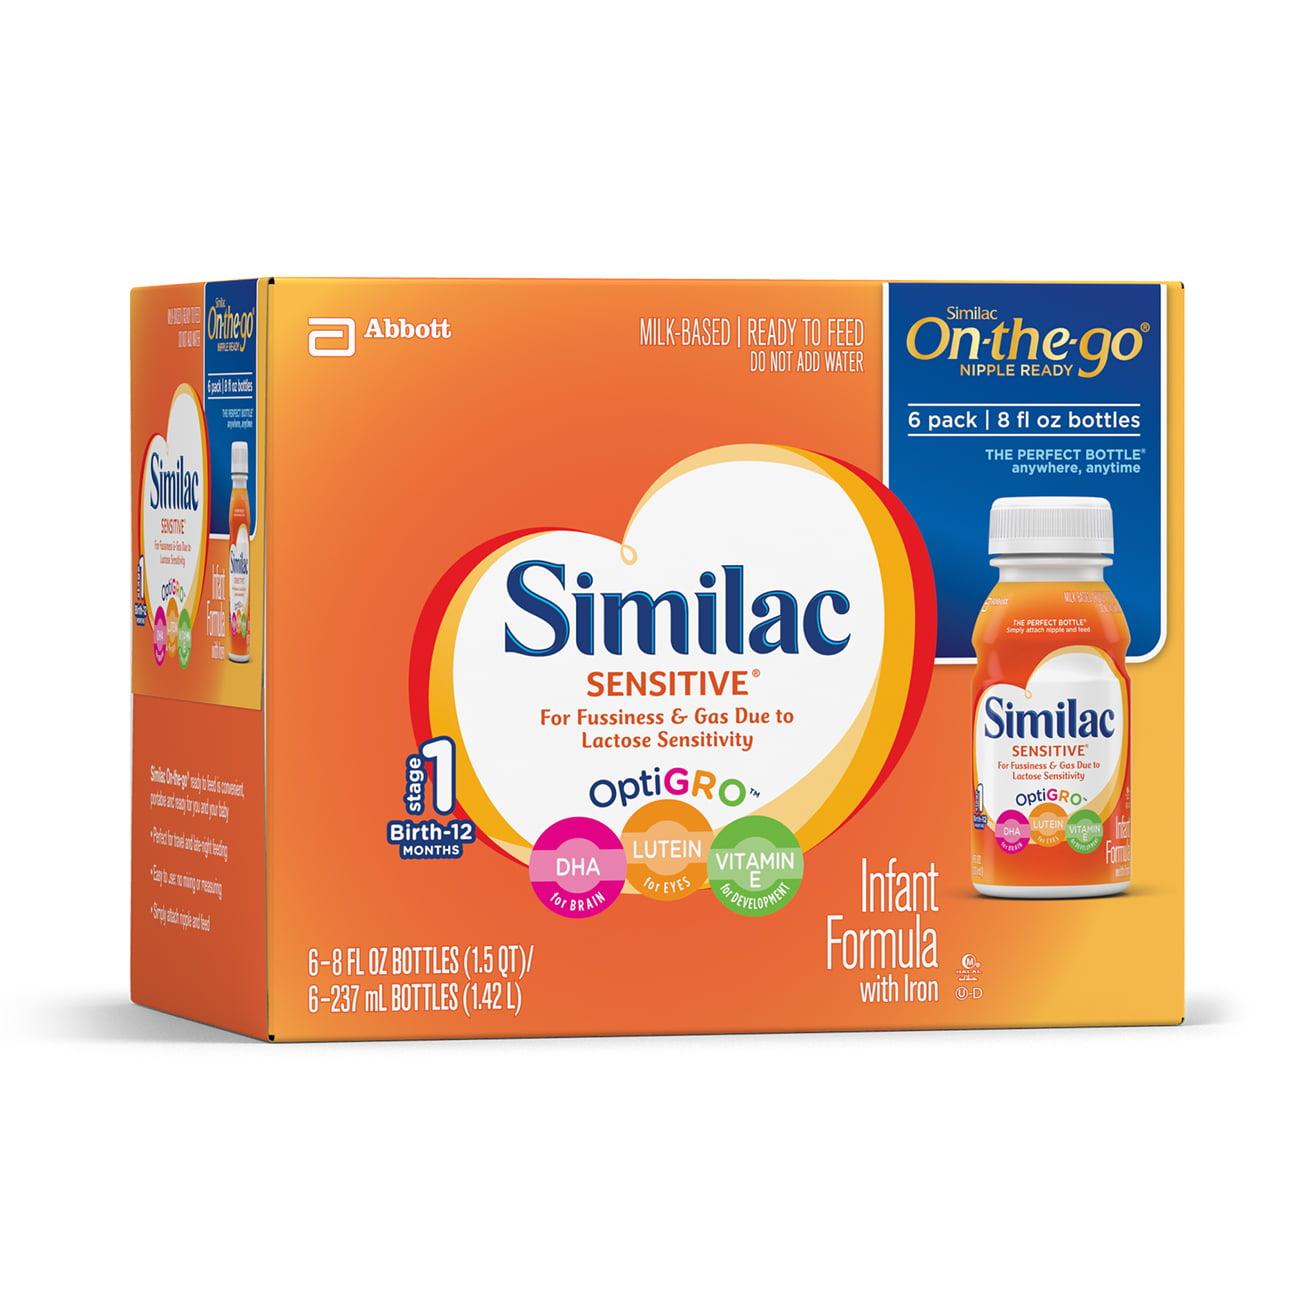 Similac Sensitive Infant Formula Ready-to-Feed (24 Count) 8 fl oz